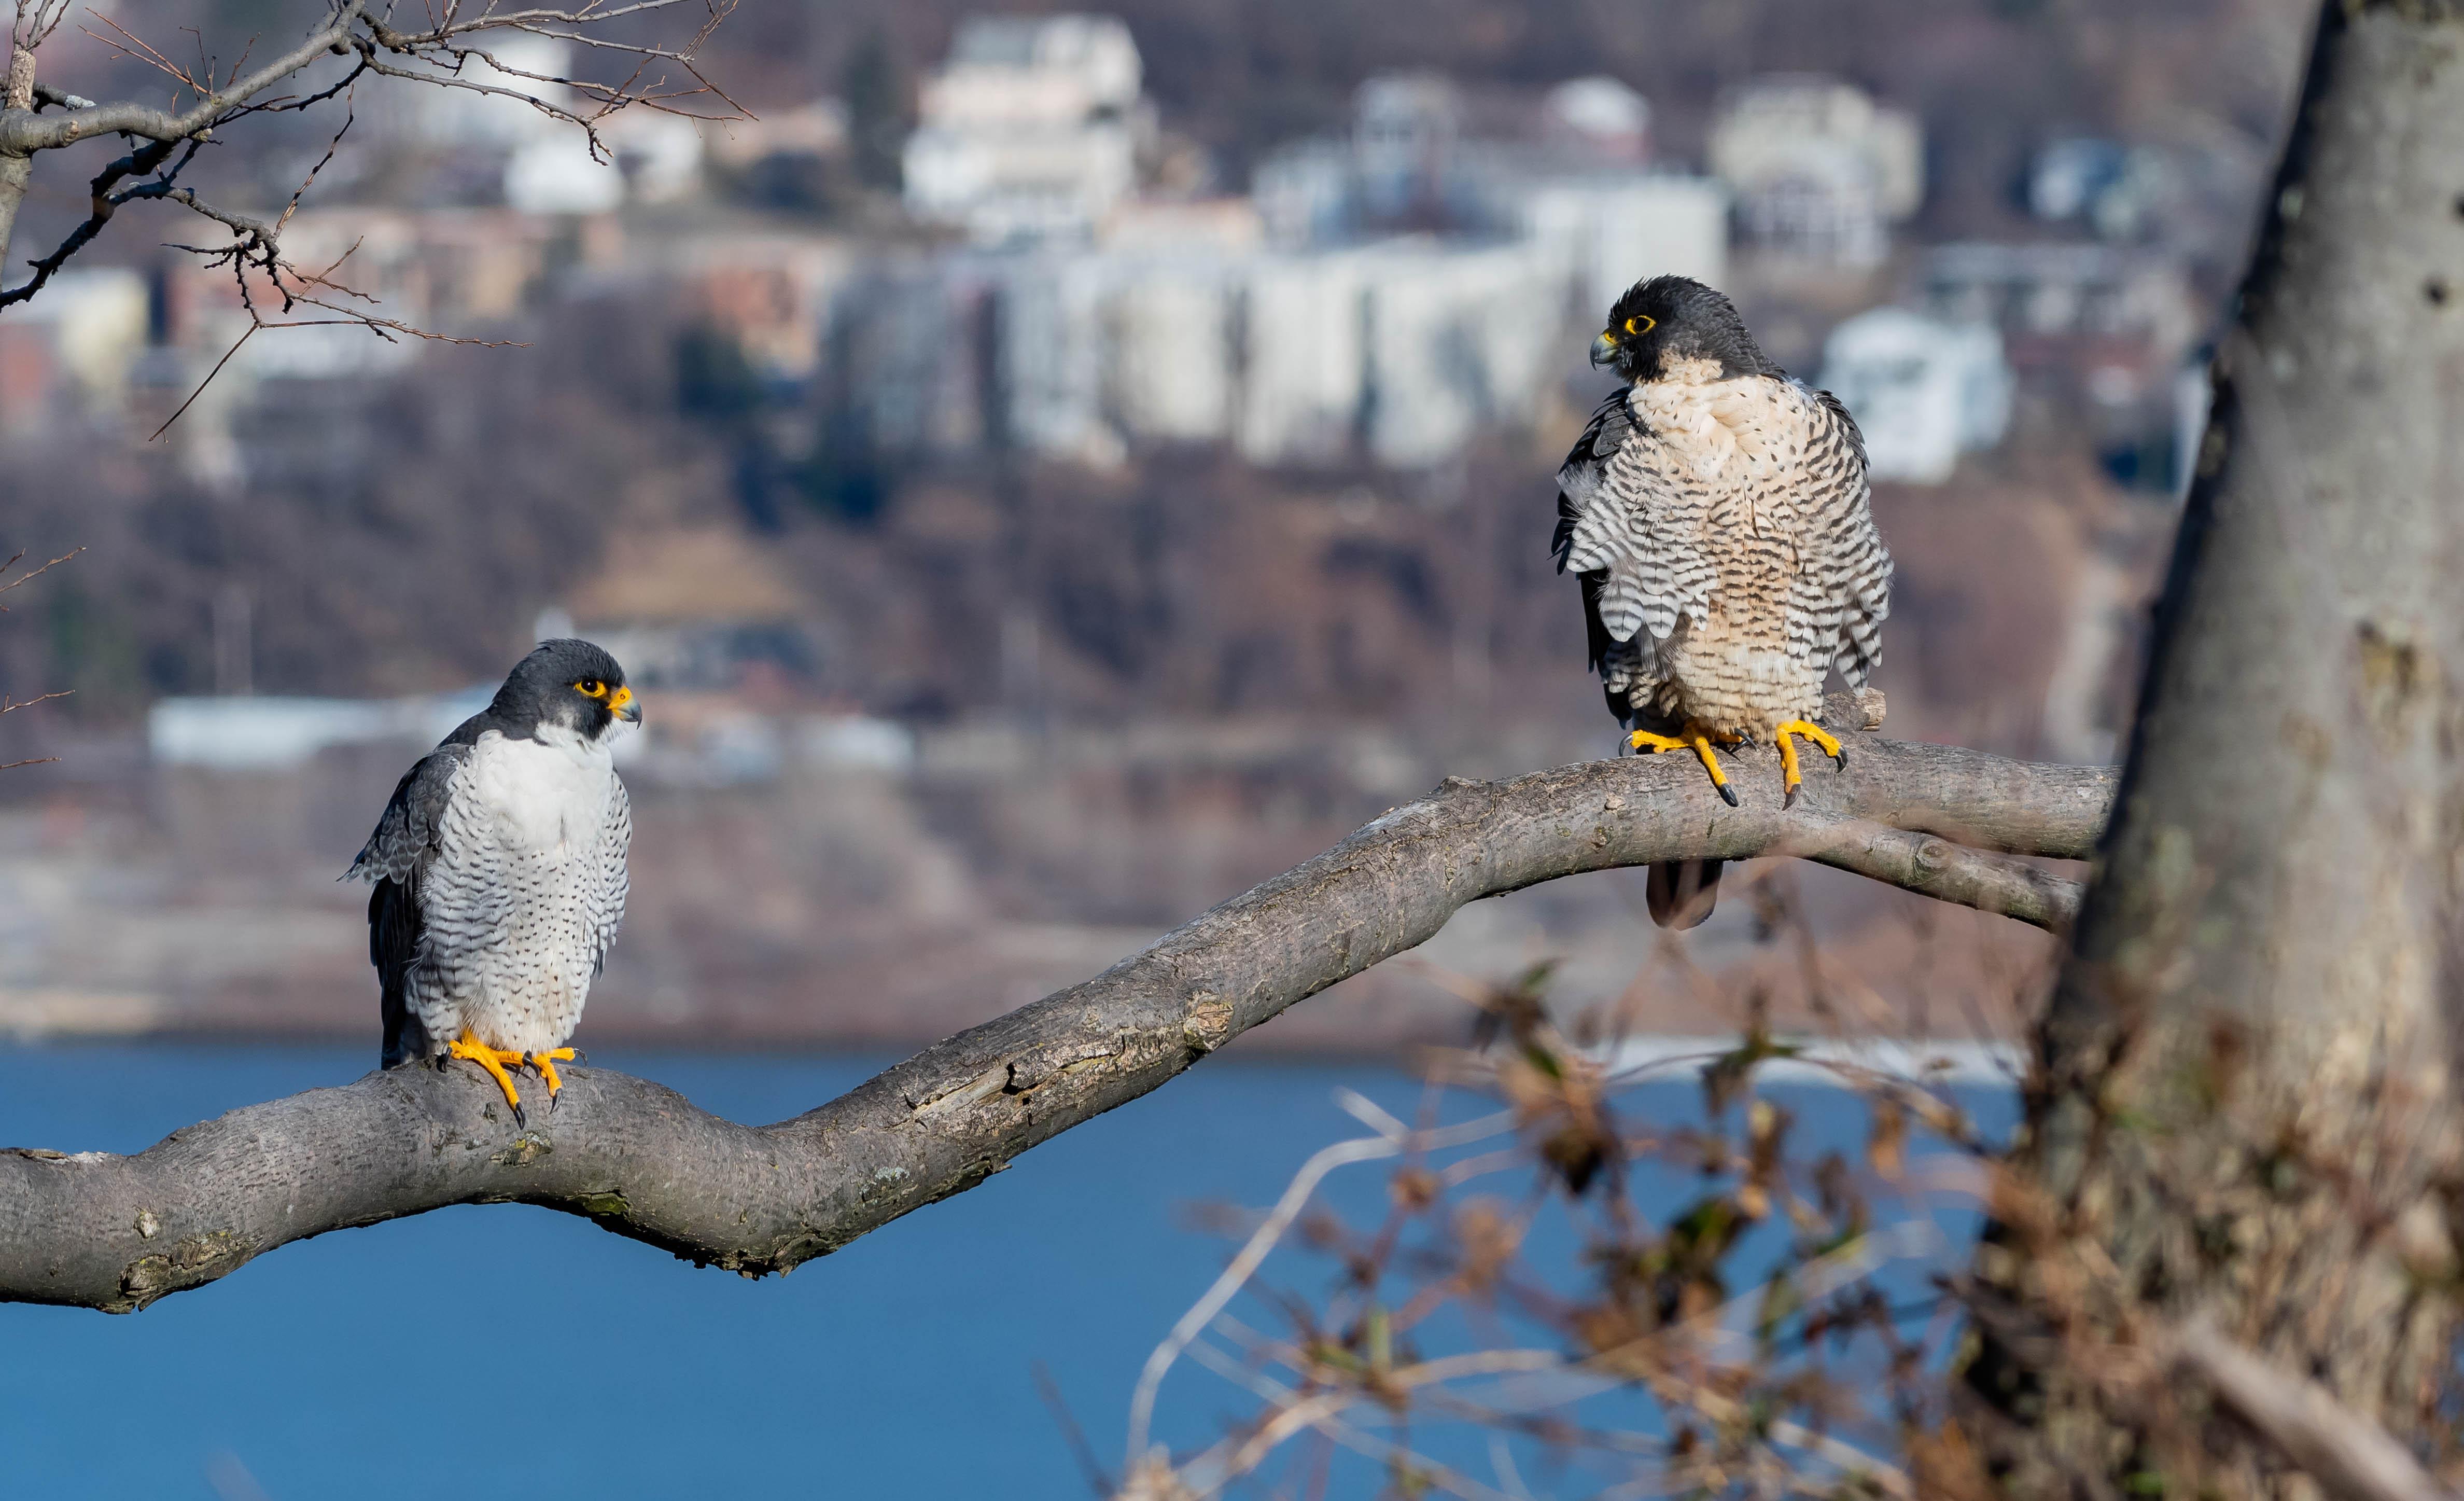 falcon_both_2-16-2019-145639.jpg